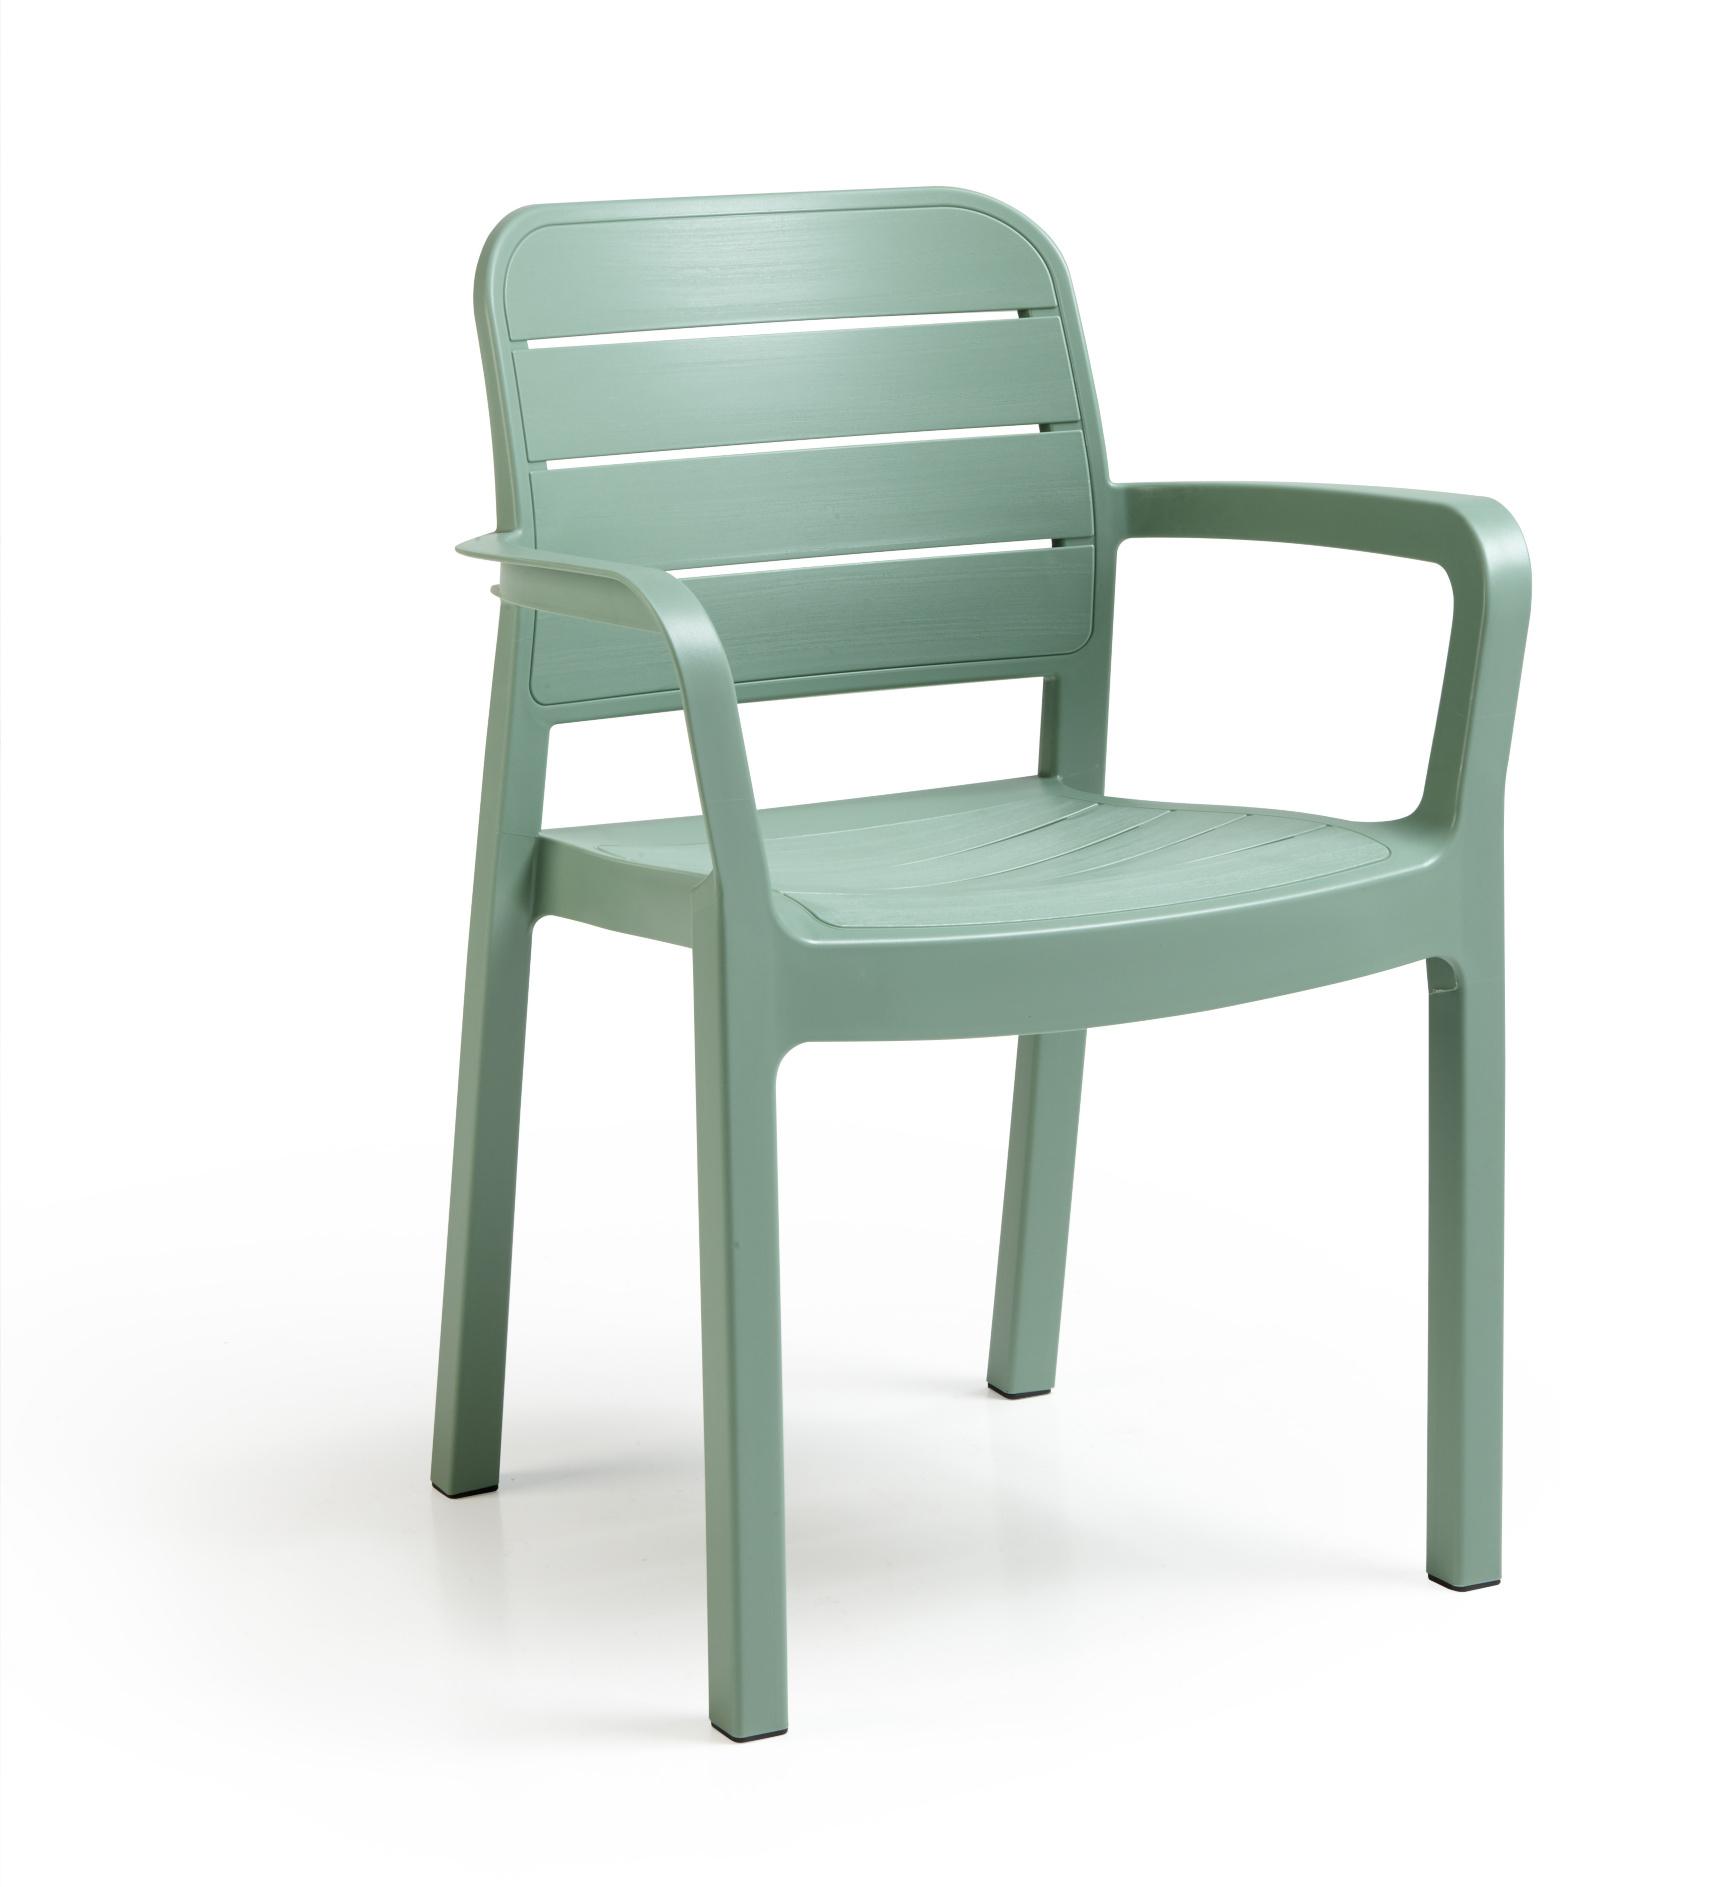 Chaises & Fauteuils De Jardin - Allibert dedans Chaise De Jardin Allibert